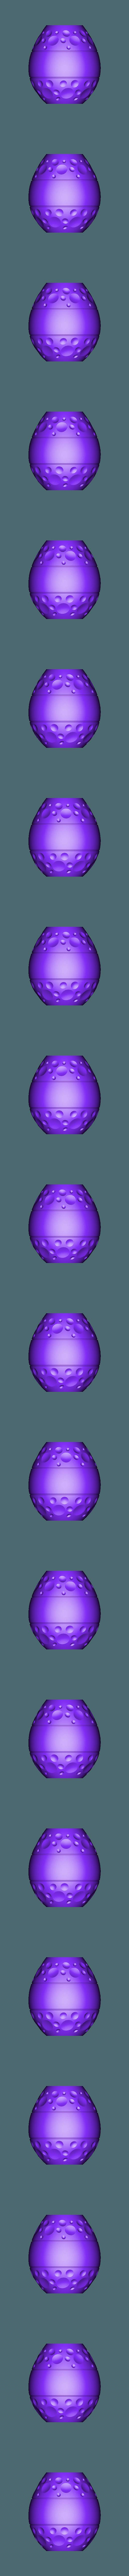 Pièce5.STL Download free STL file moon vases • Object to 3D print, rom1pelletier